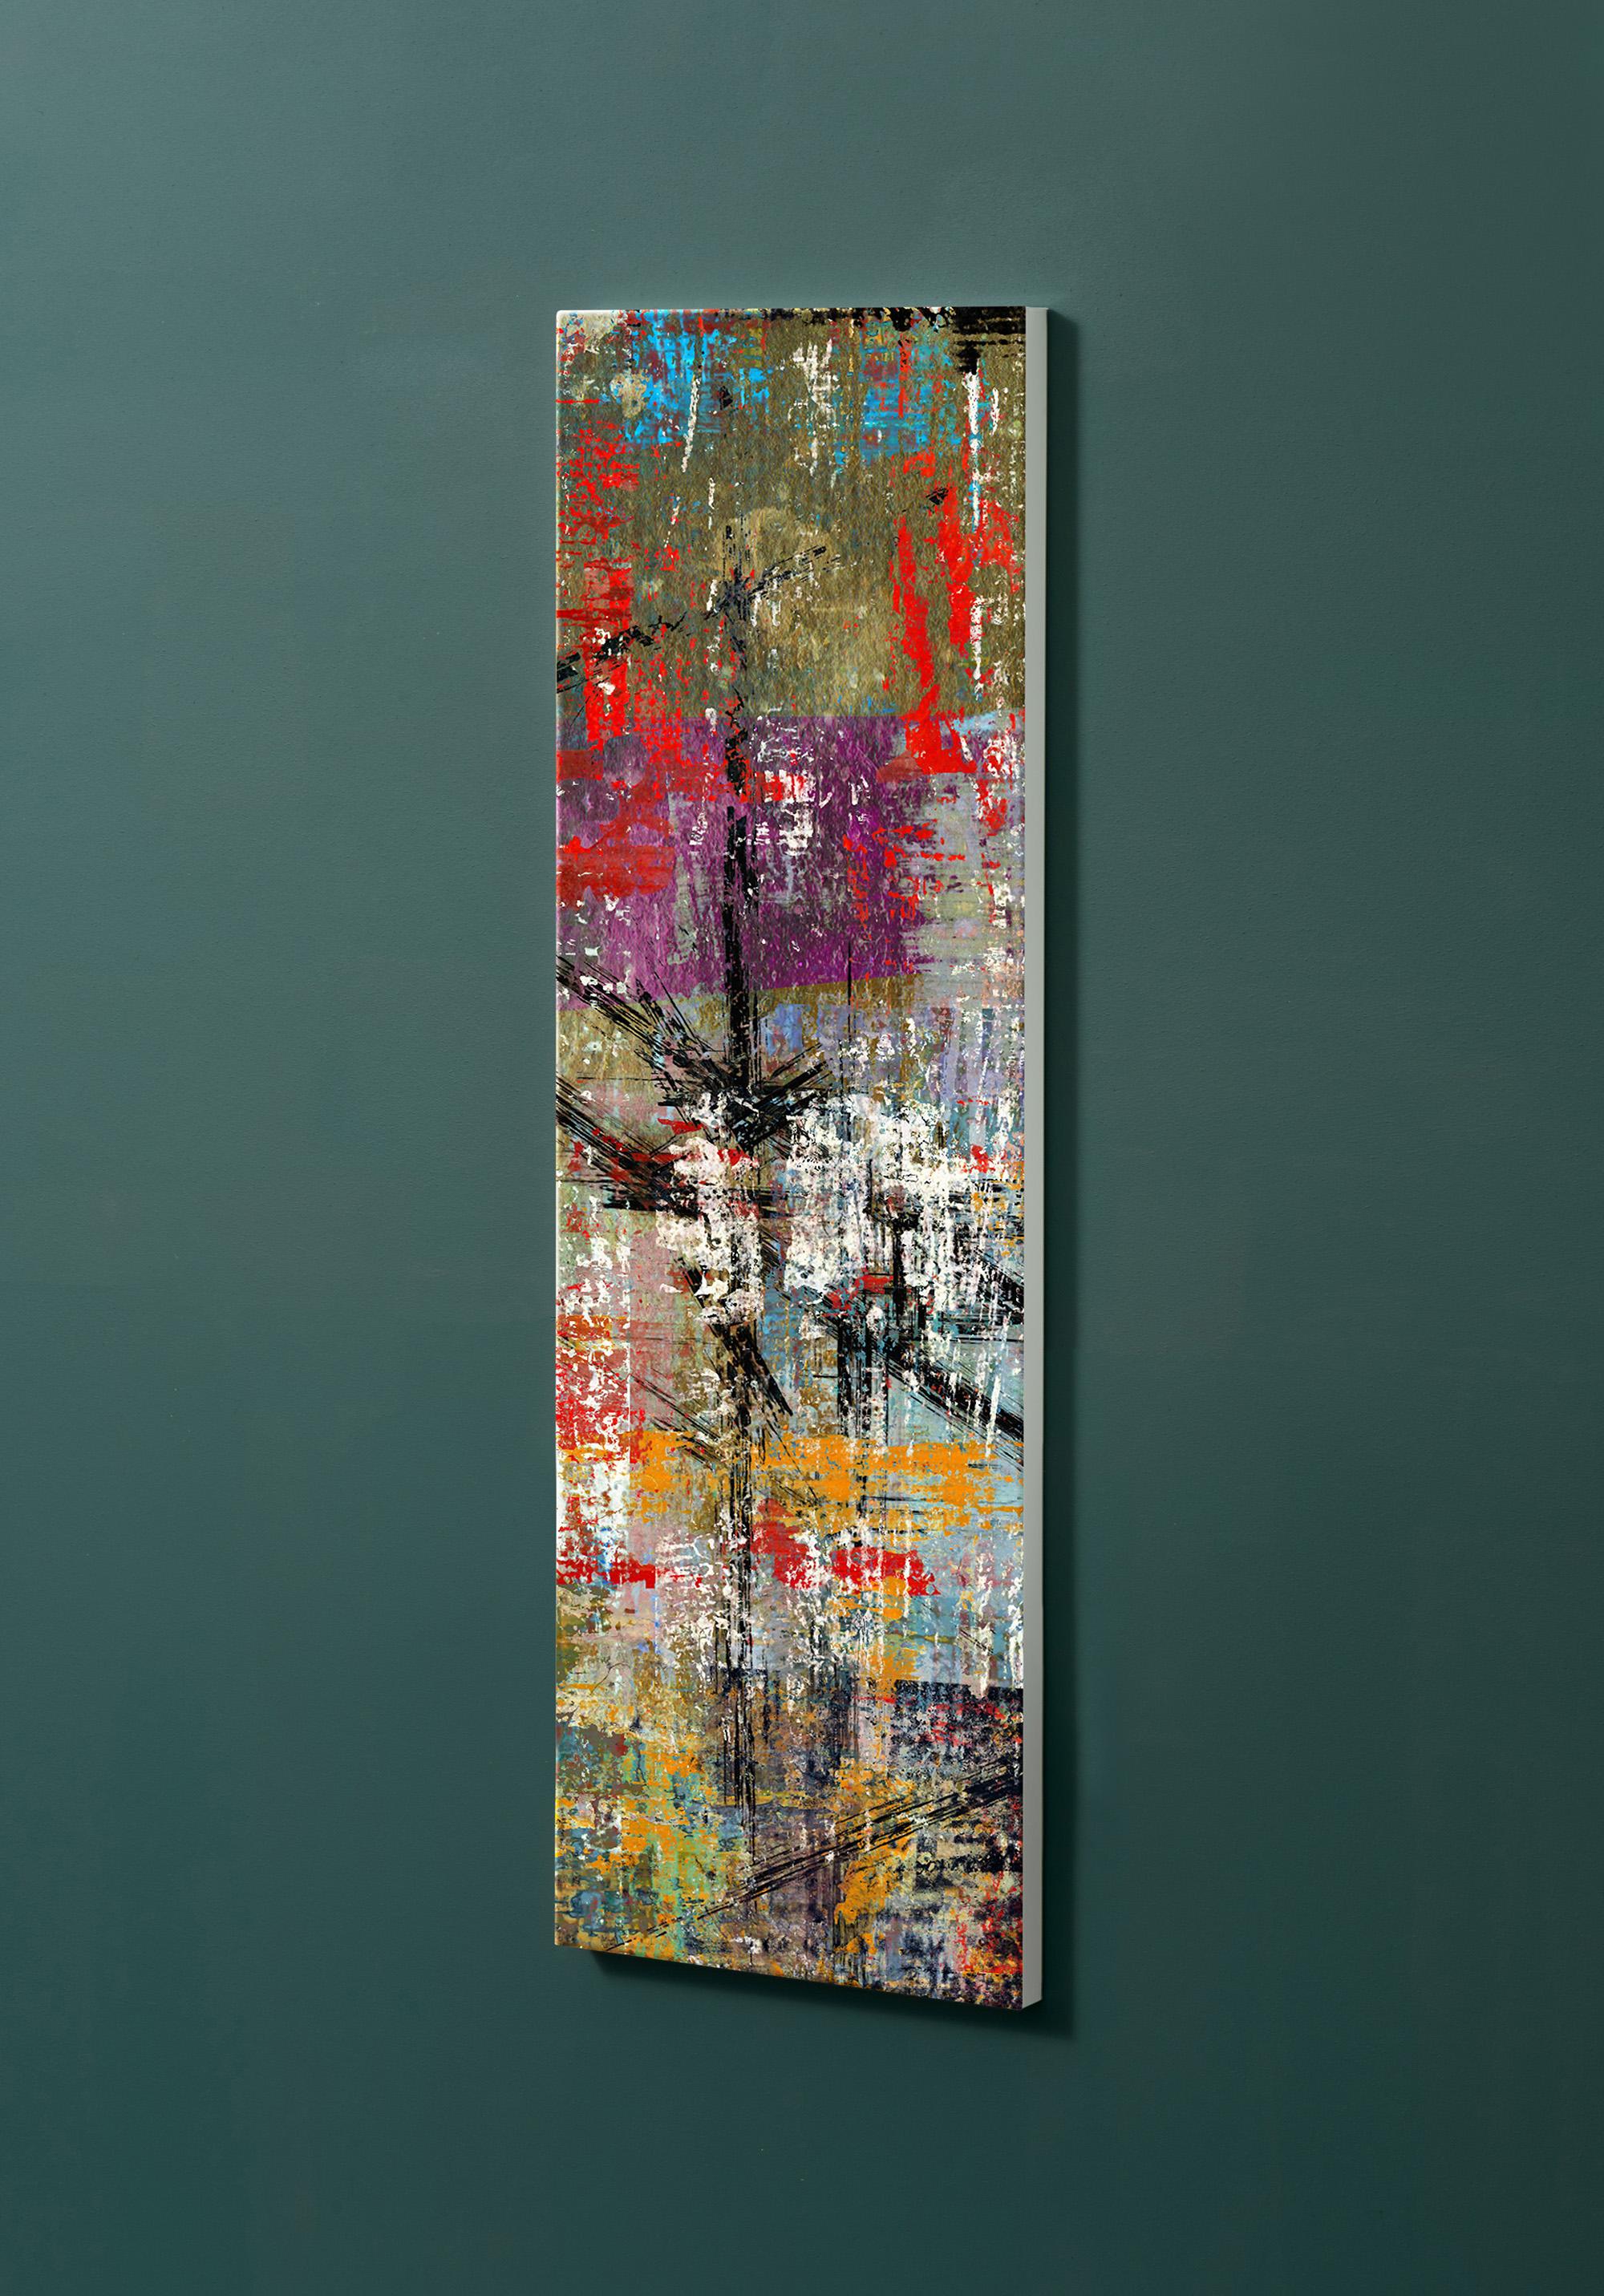 Magnettafel NOTIZ 30x90cm Motiv-Pinnwand M111 Abstrakt Kunst